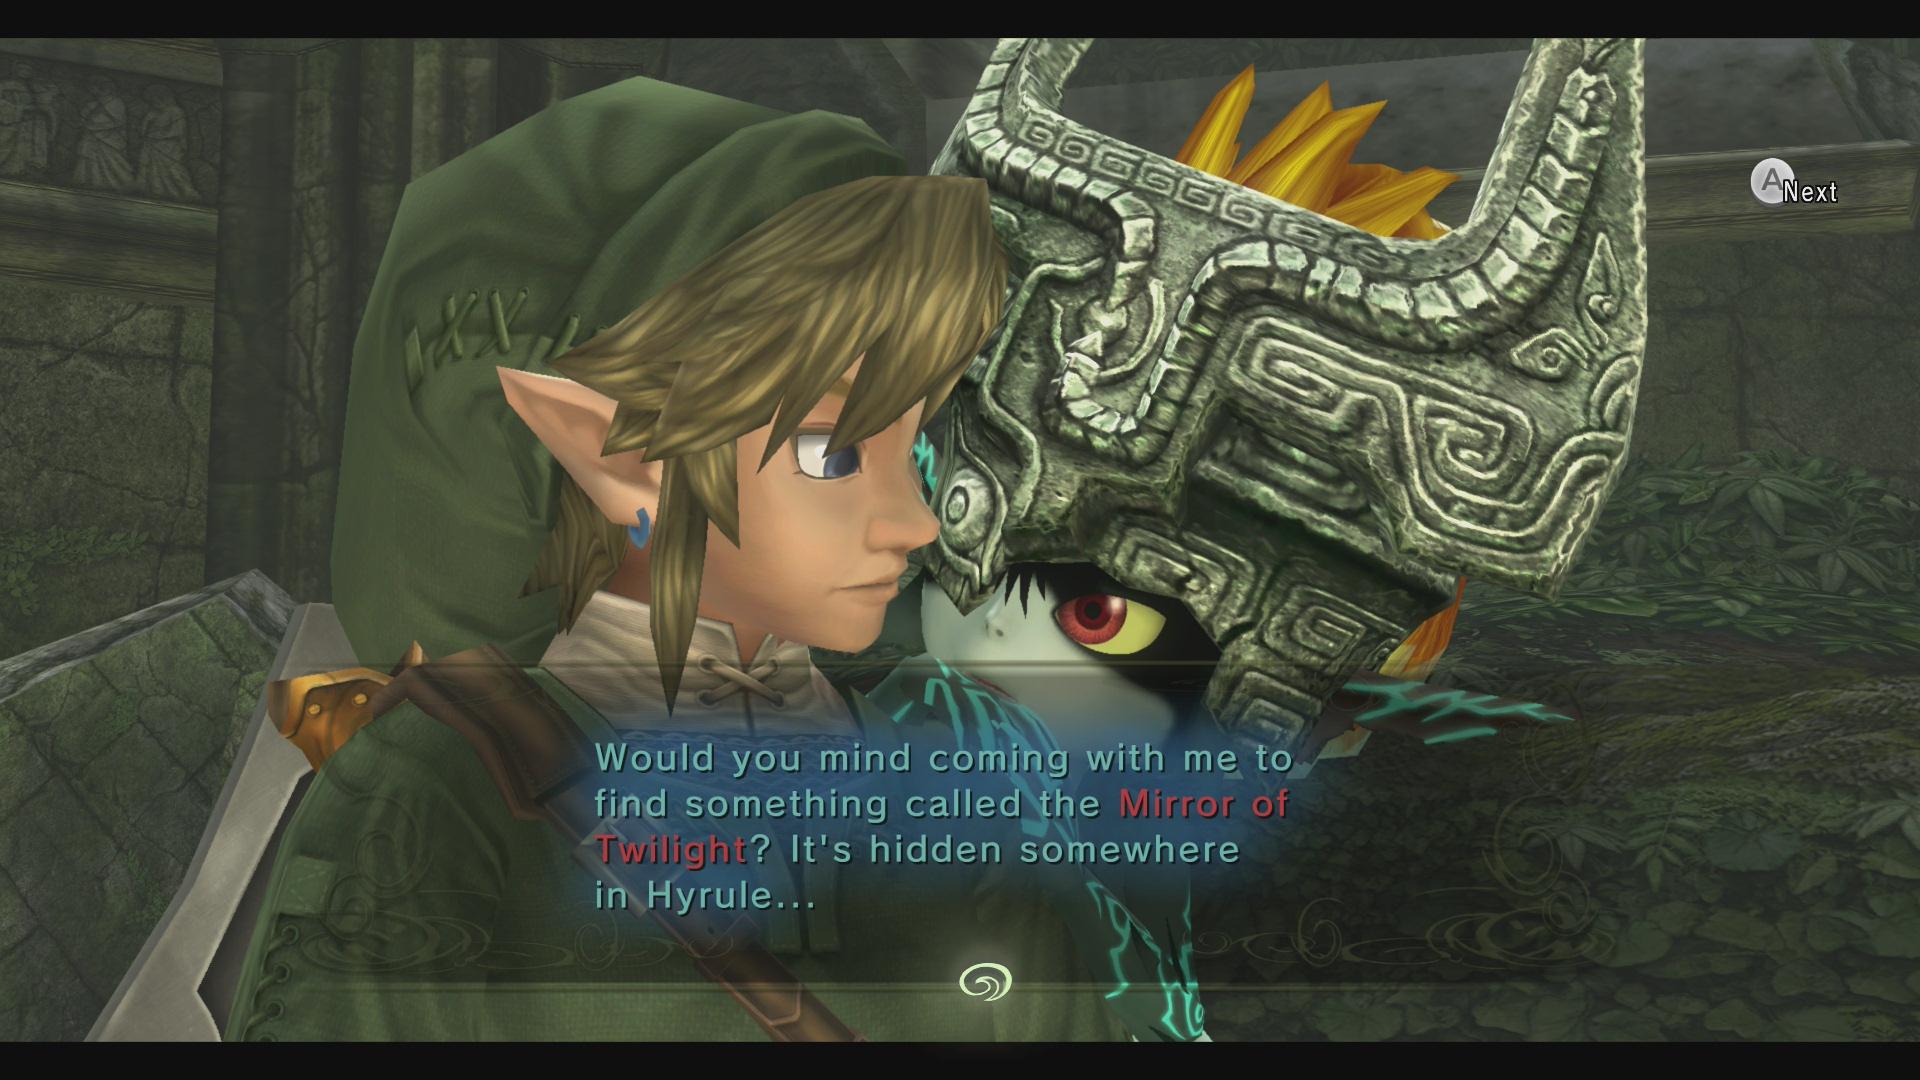 Legend Of Zelda Breath Of The Wild Wallpaper Hd The Legend Of Zelda Twilight Princess Hd Review Rpg Site